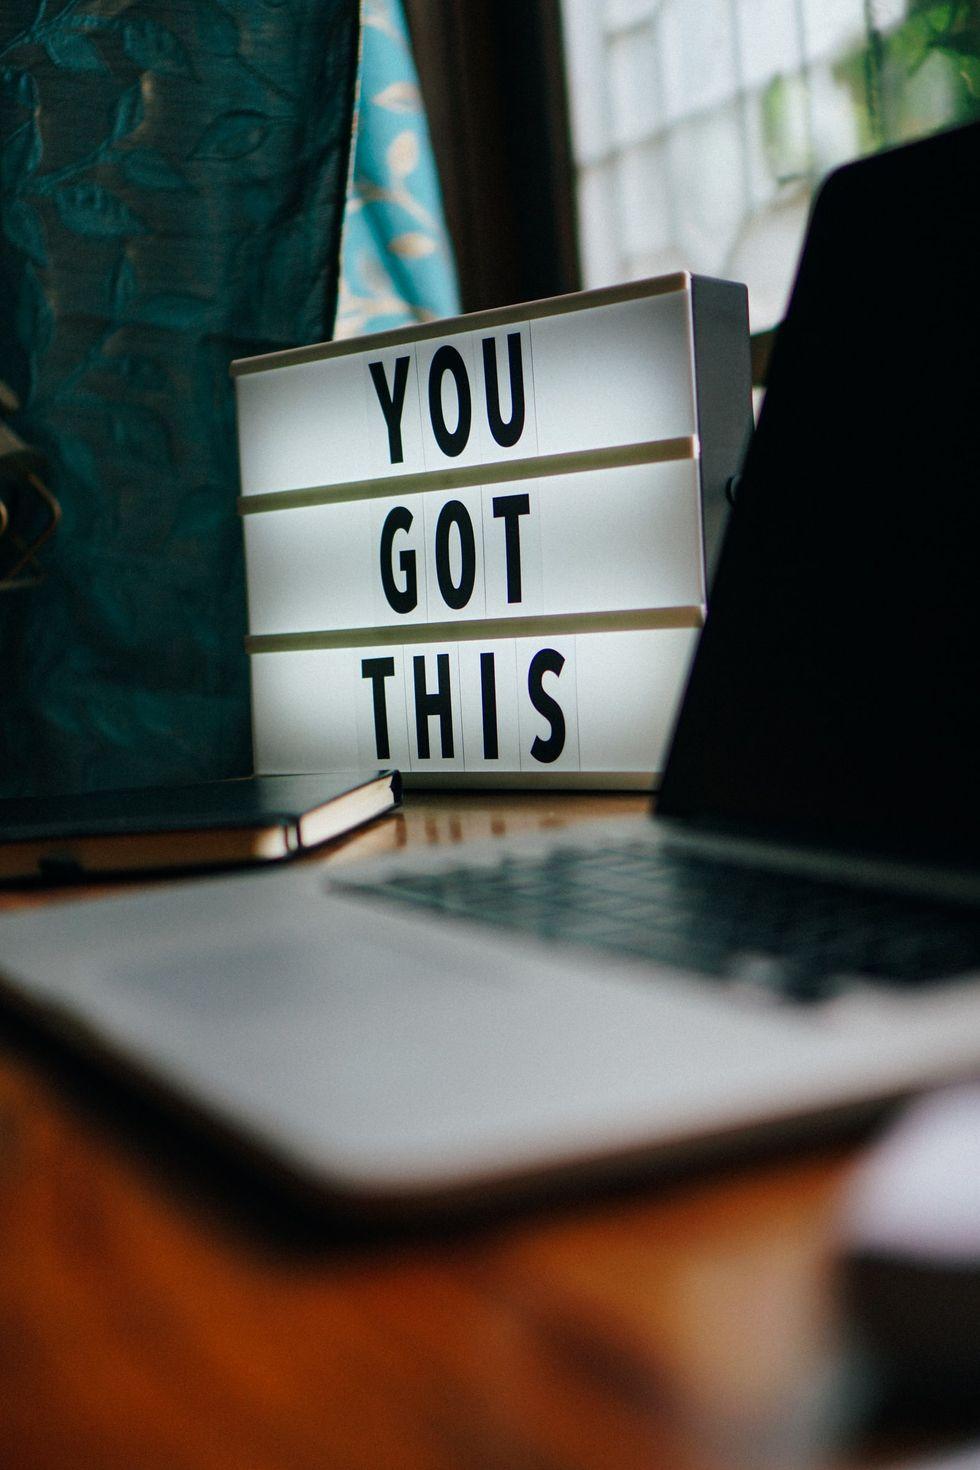 Quotes that motivate me!